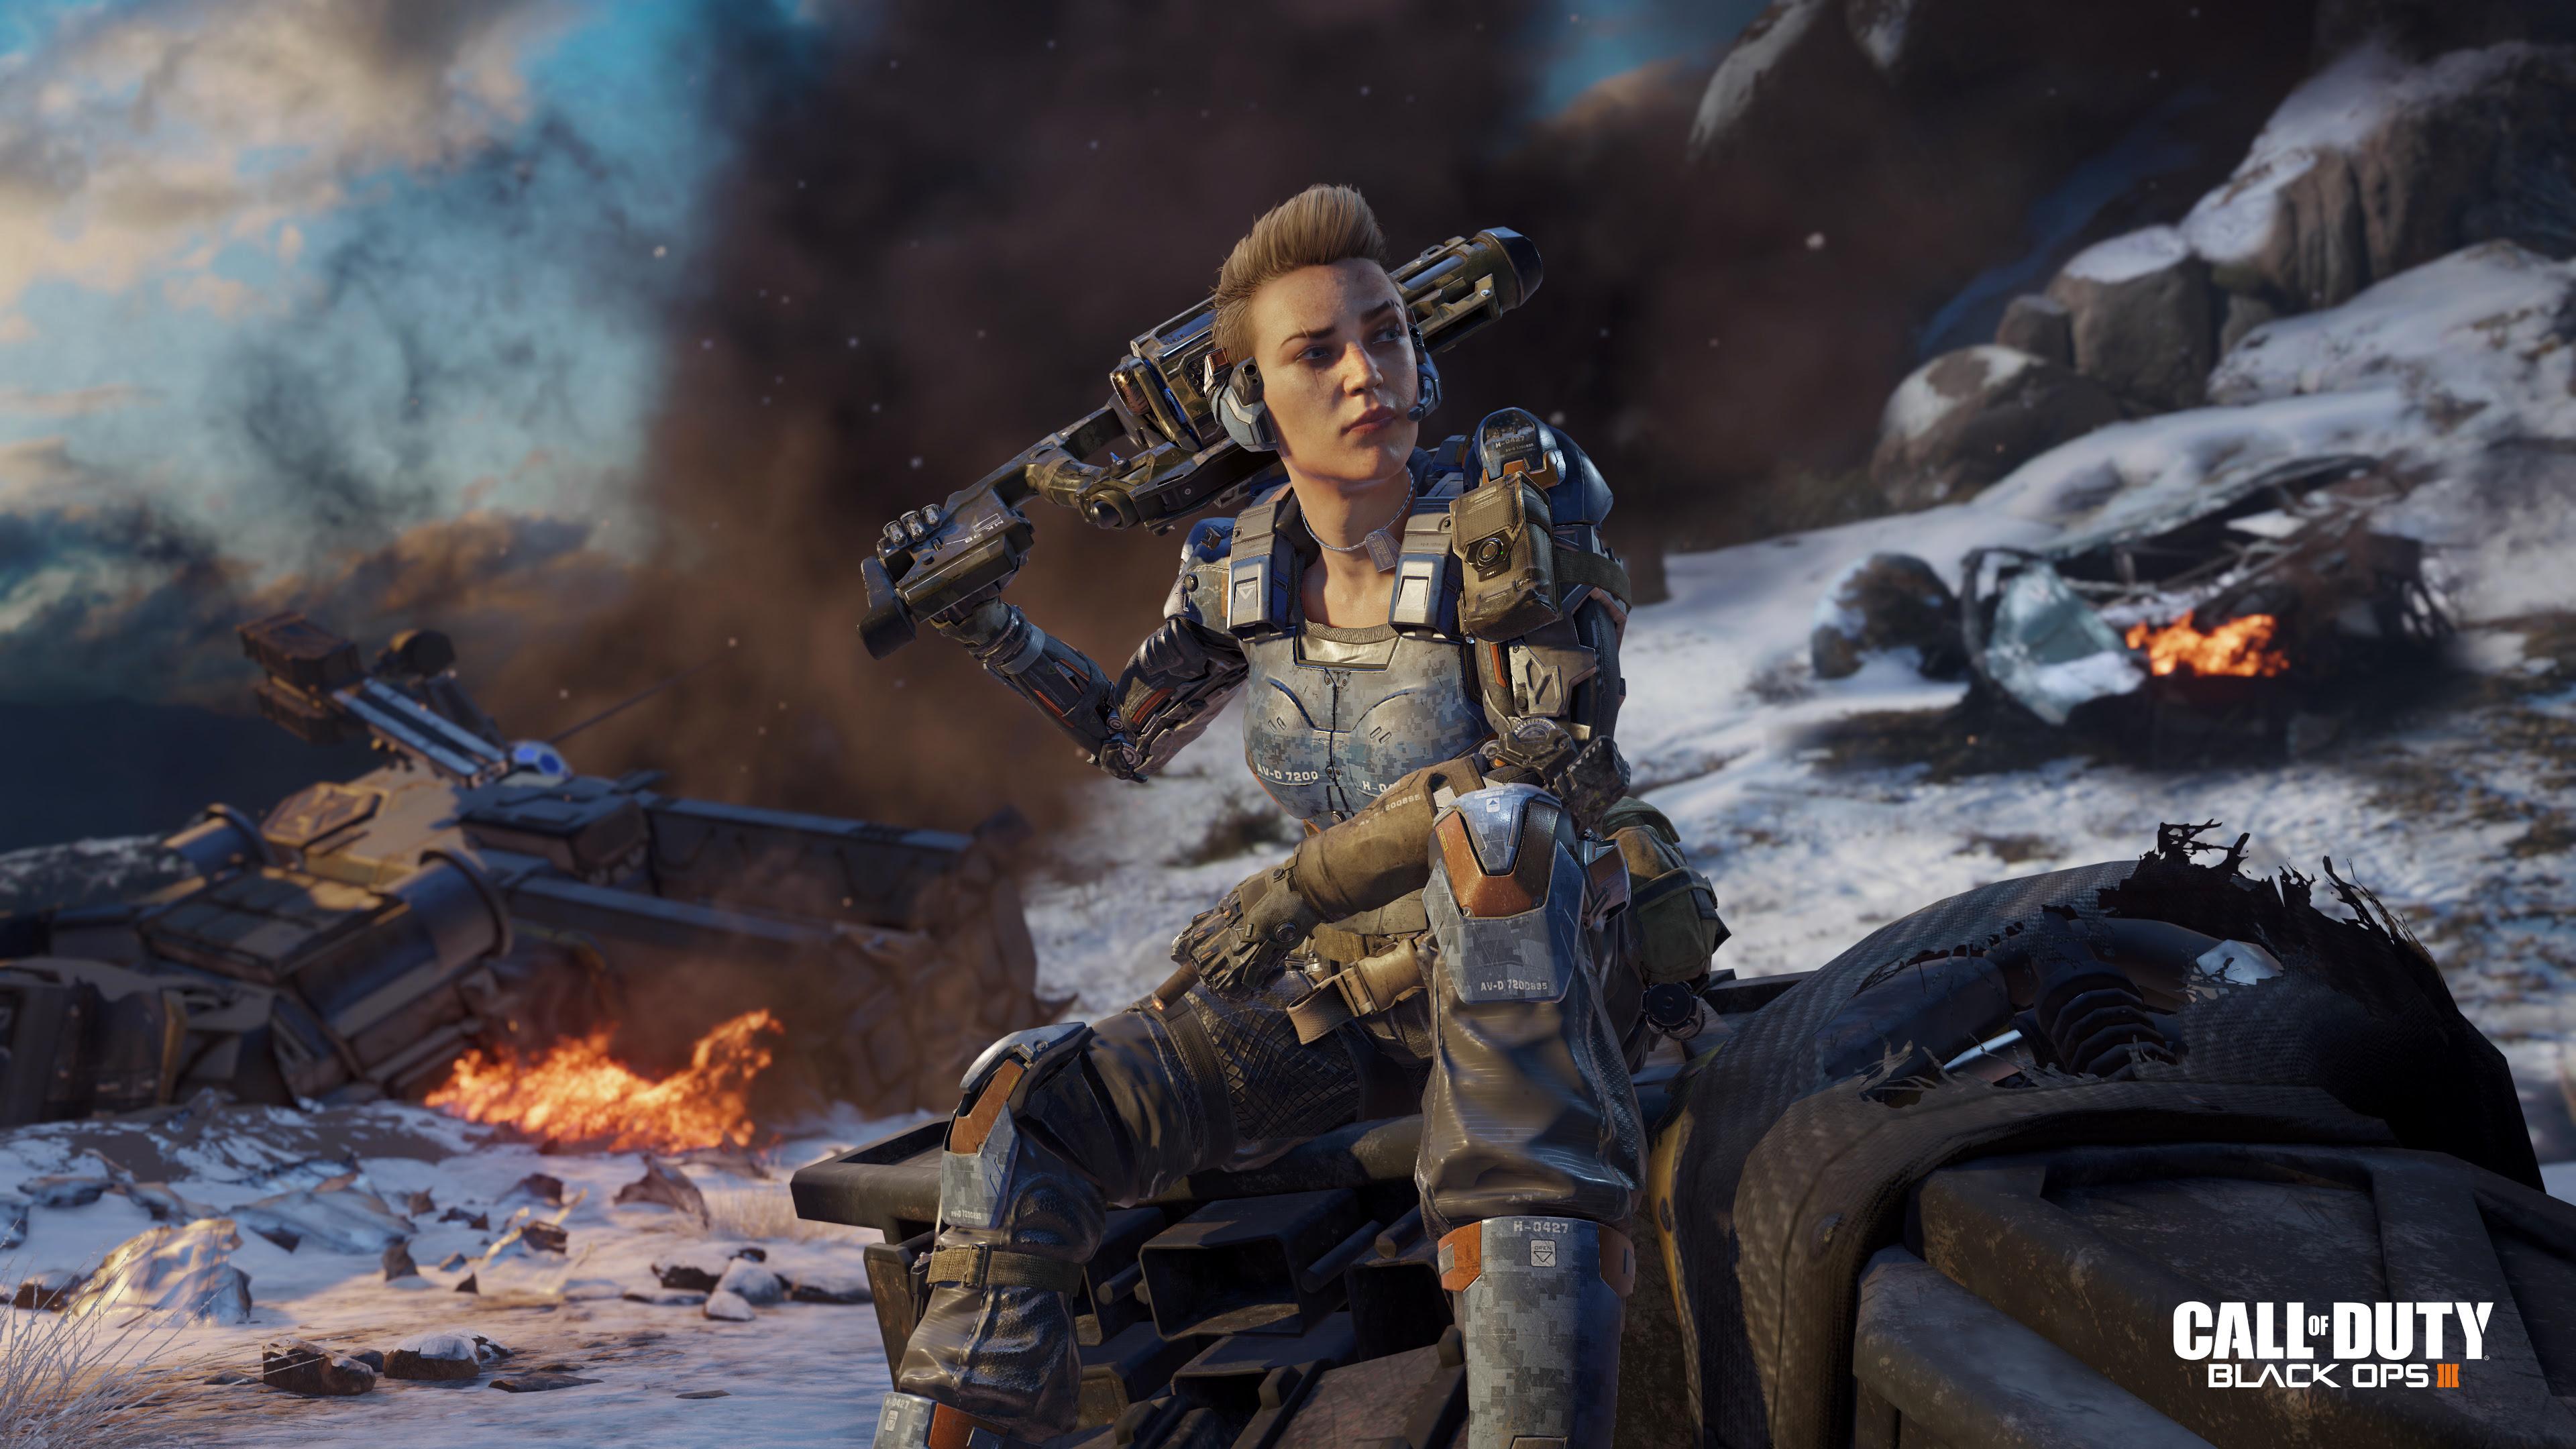 Call of Duty: Black Ops 3 Gets a New Set of 4K Screenshots ...